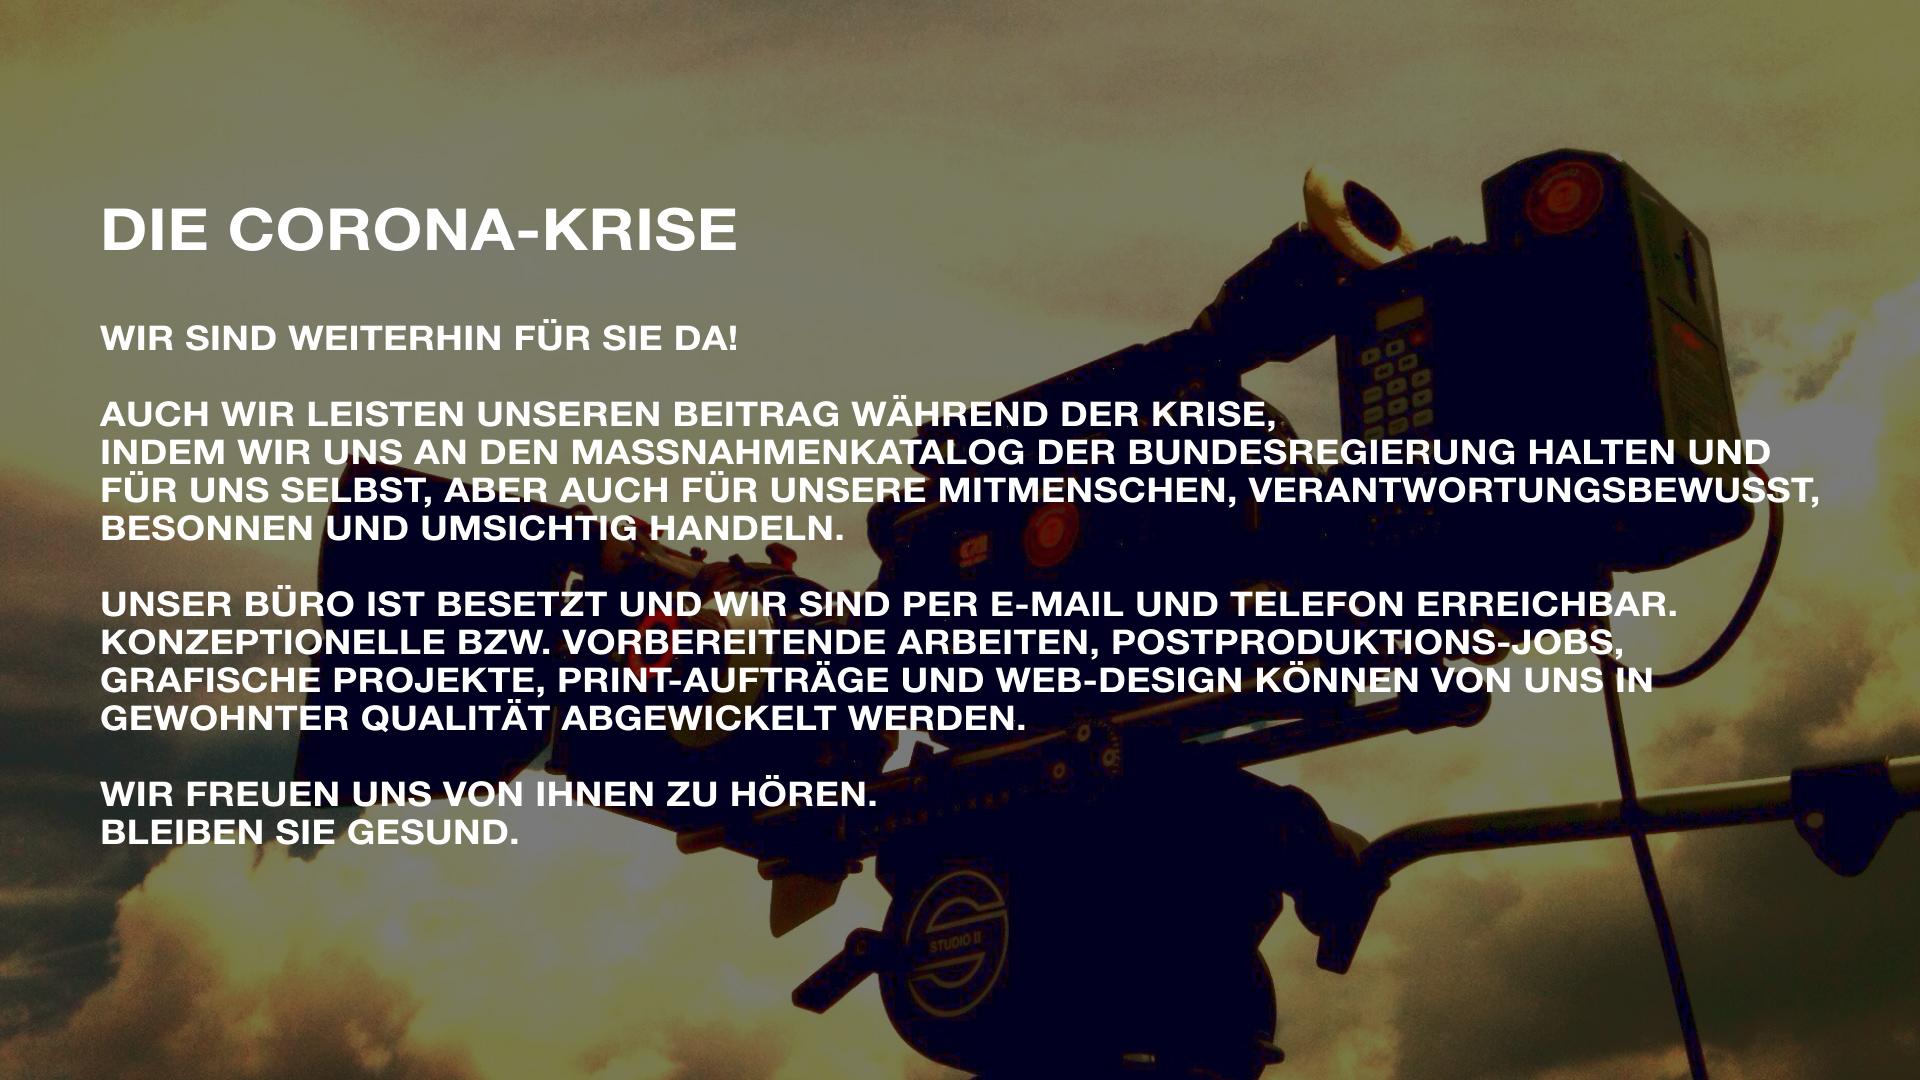 Corona Krise Poster. 2jpg - Strickroth & Fiege Fotografie